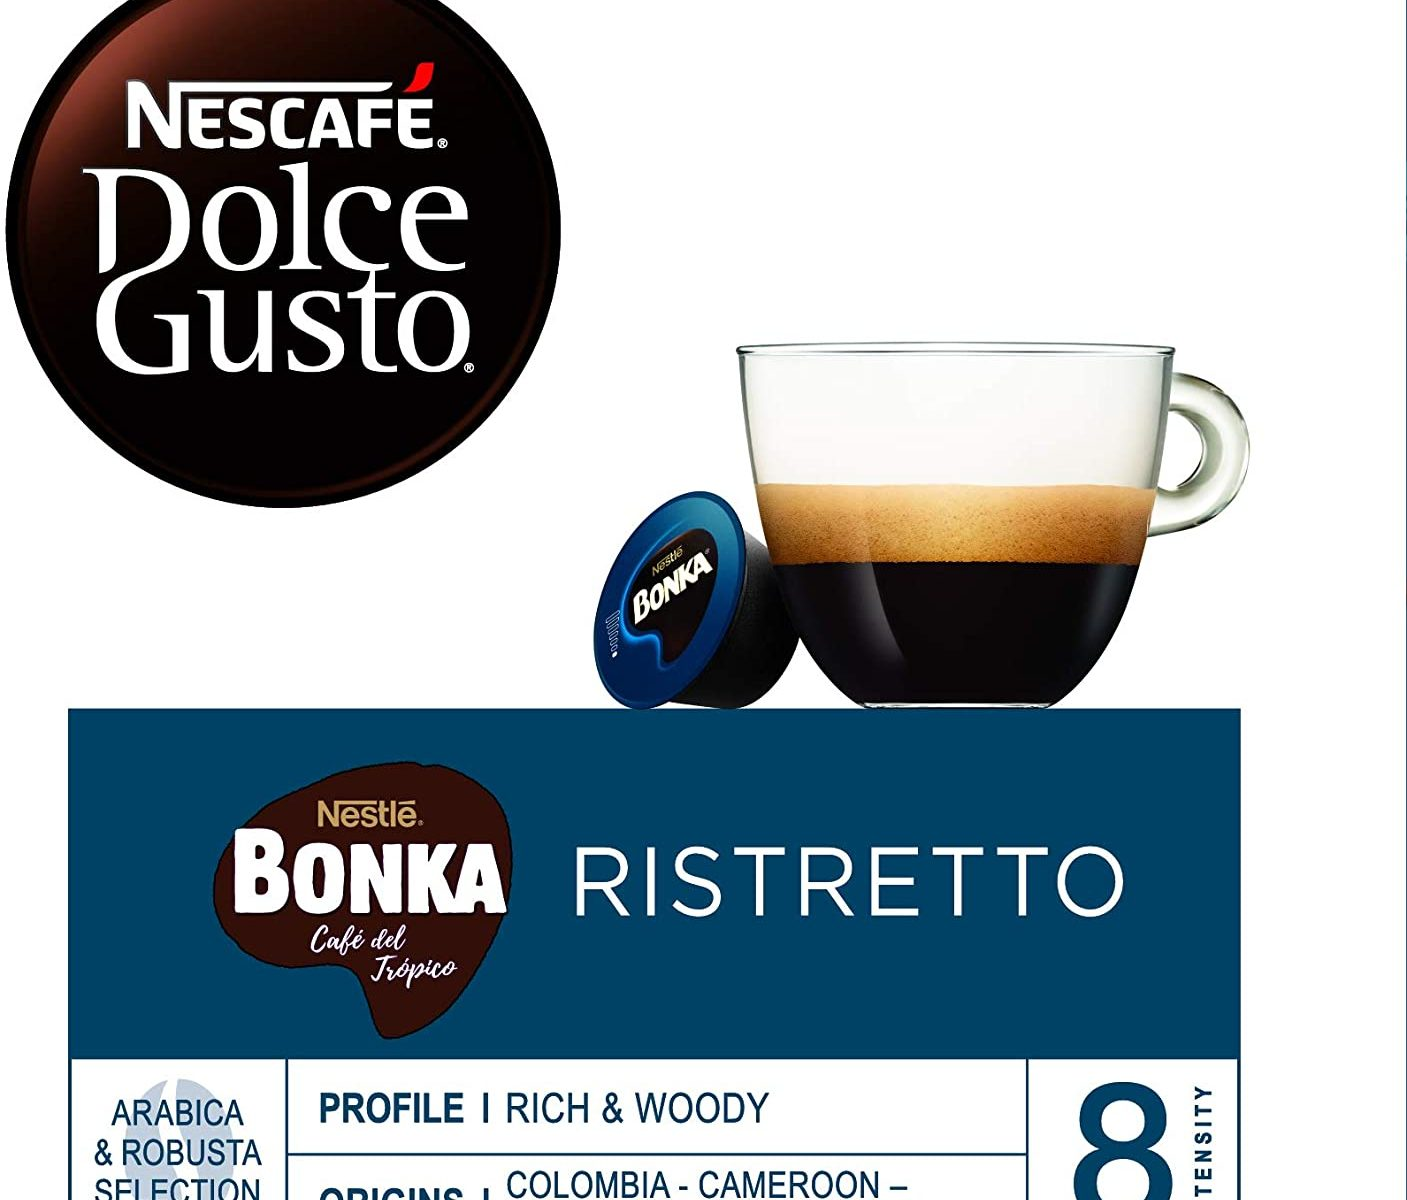 Nescafé DOLCE GUSTO Café BONKA.